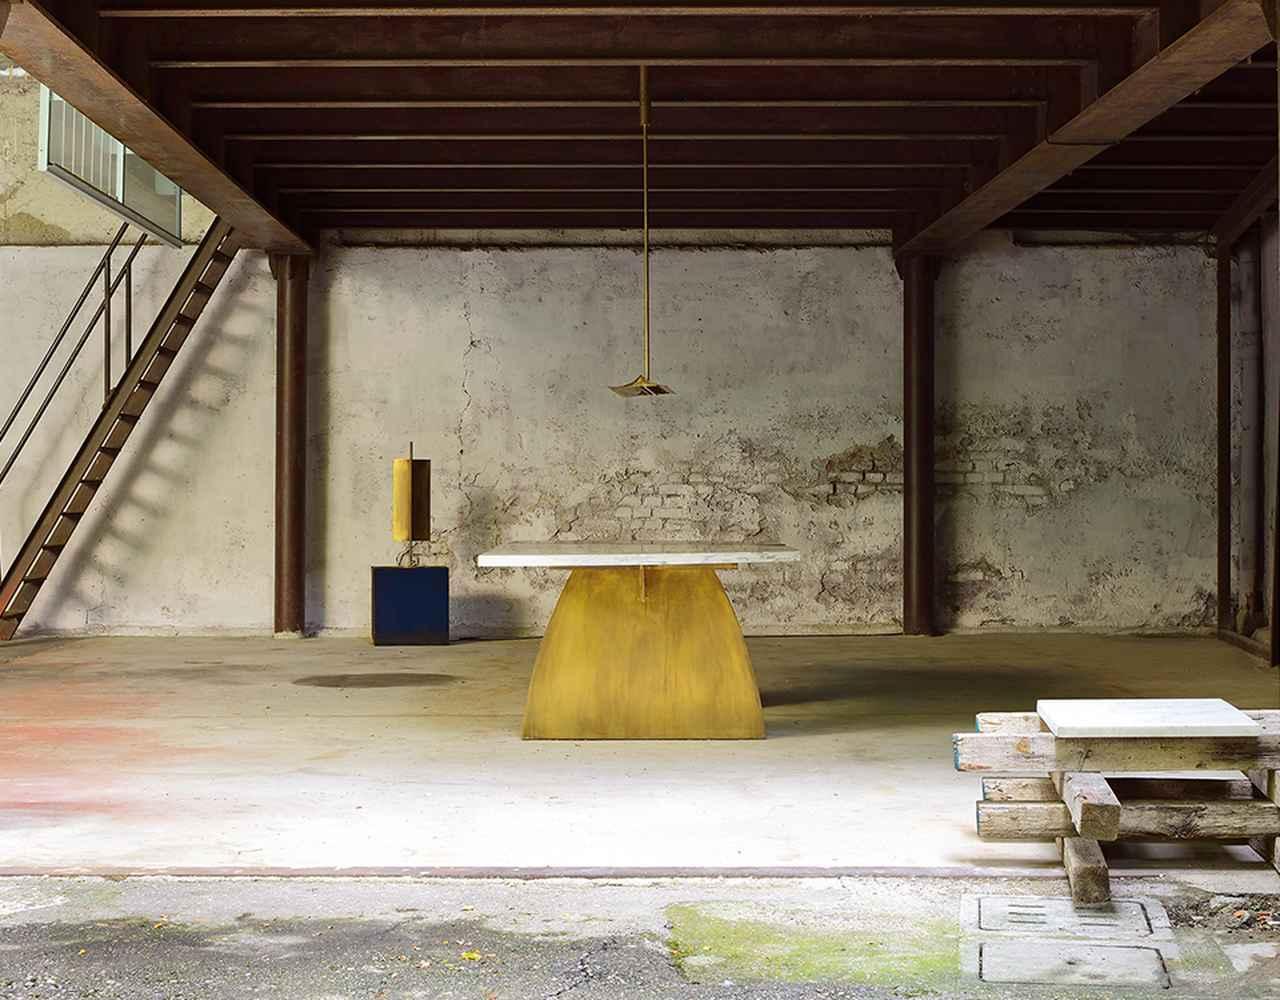 Images : 4番目の画像 - 「建築家トニョンが試みる 実験的な住まいのかたち」のアルバム - T JAPAN:The New York Times Style Magazine 公式サイト